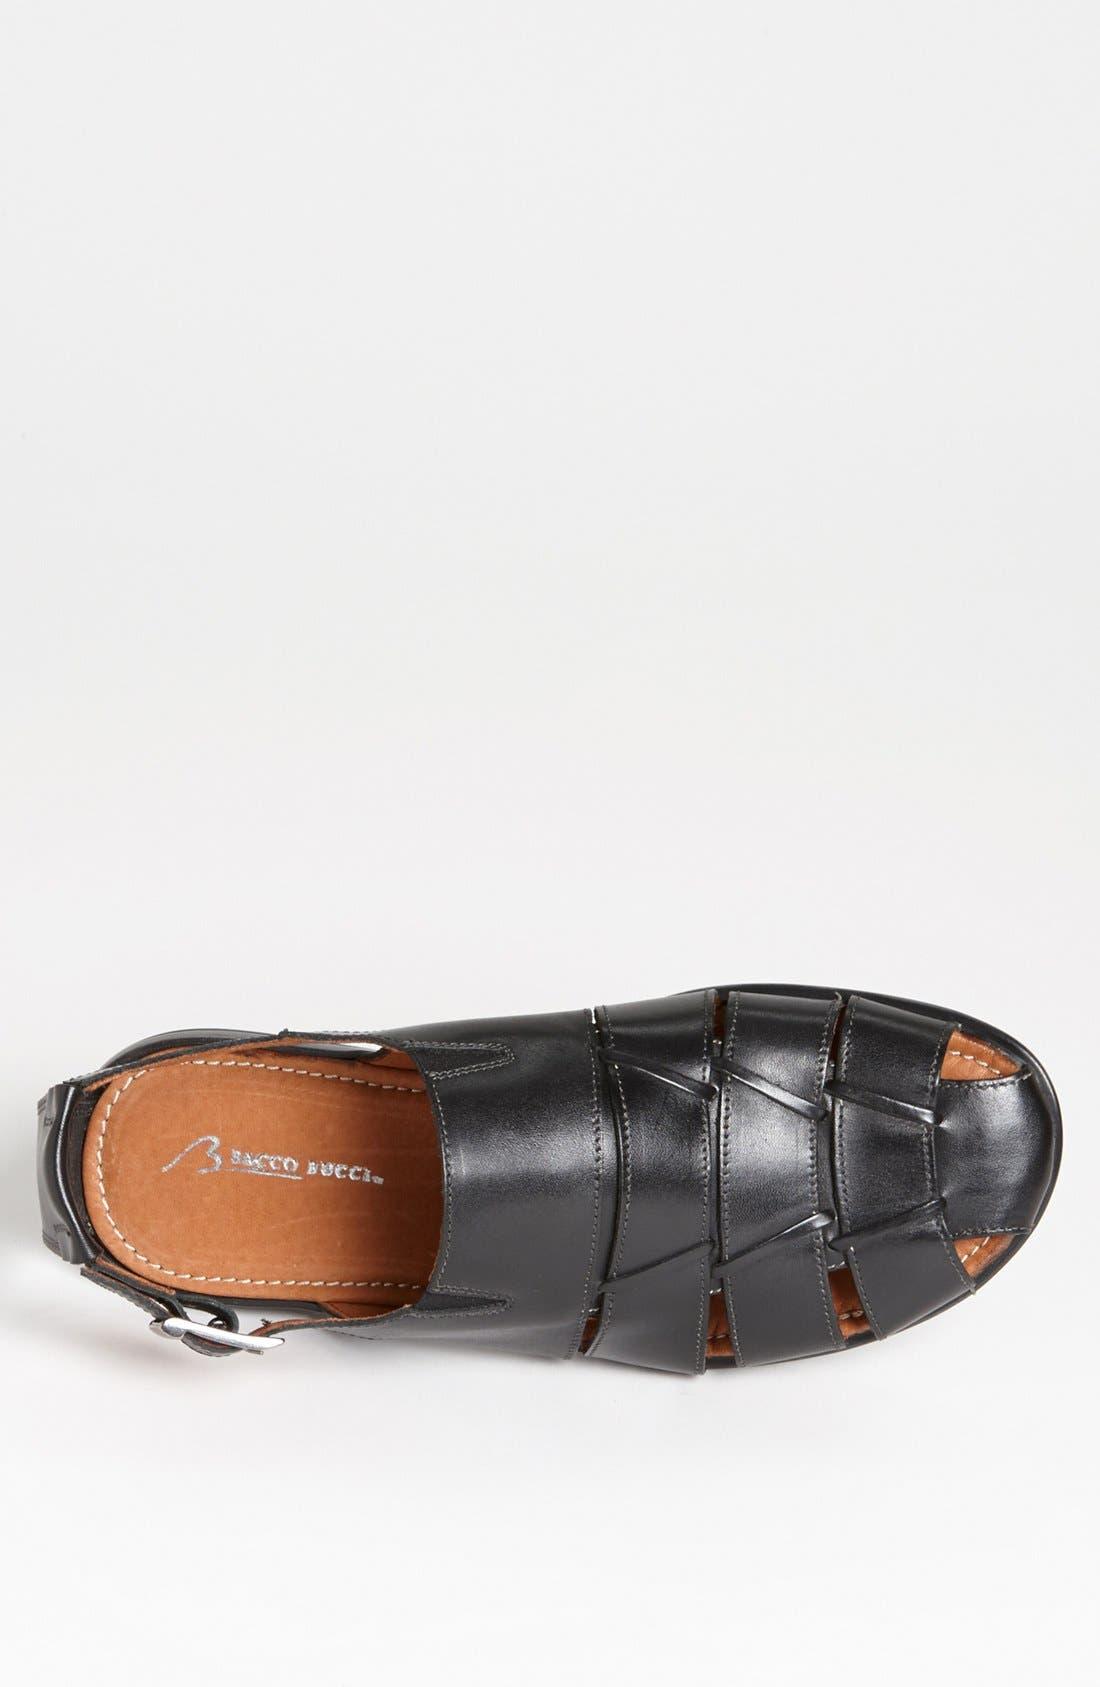 Alternate Image 3  - Bacco Bucci 'Valdano' Sandal (Men)